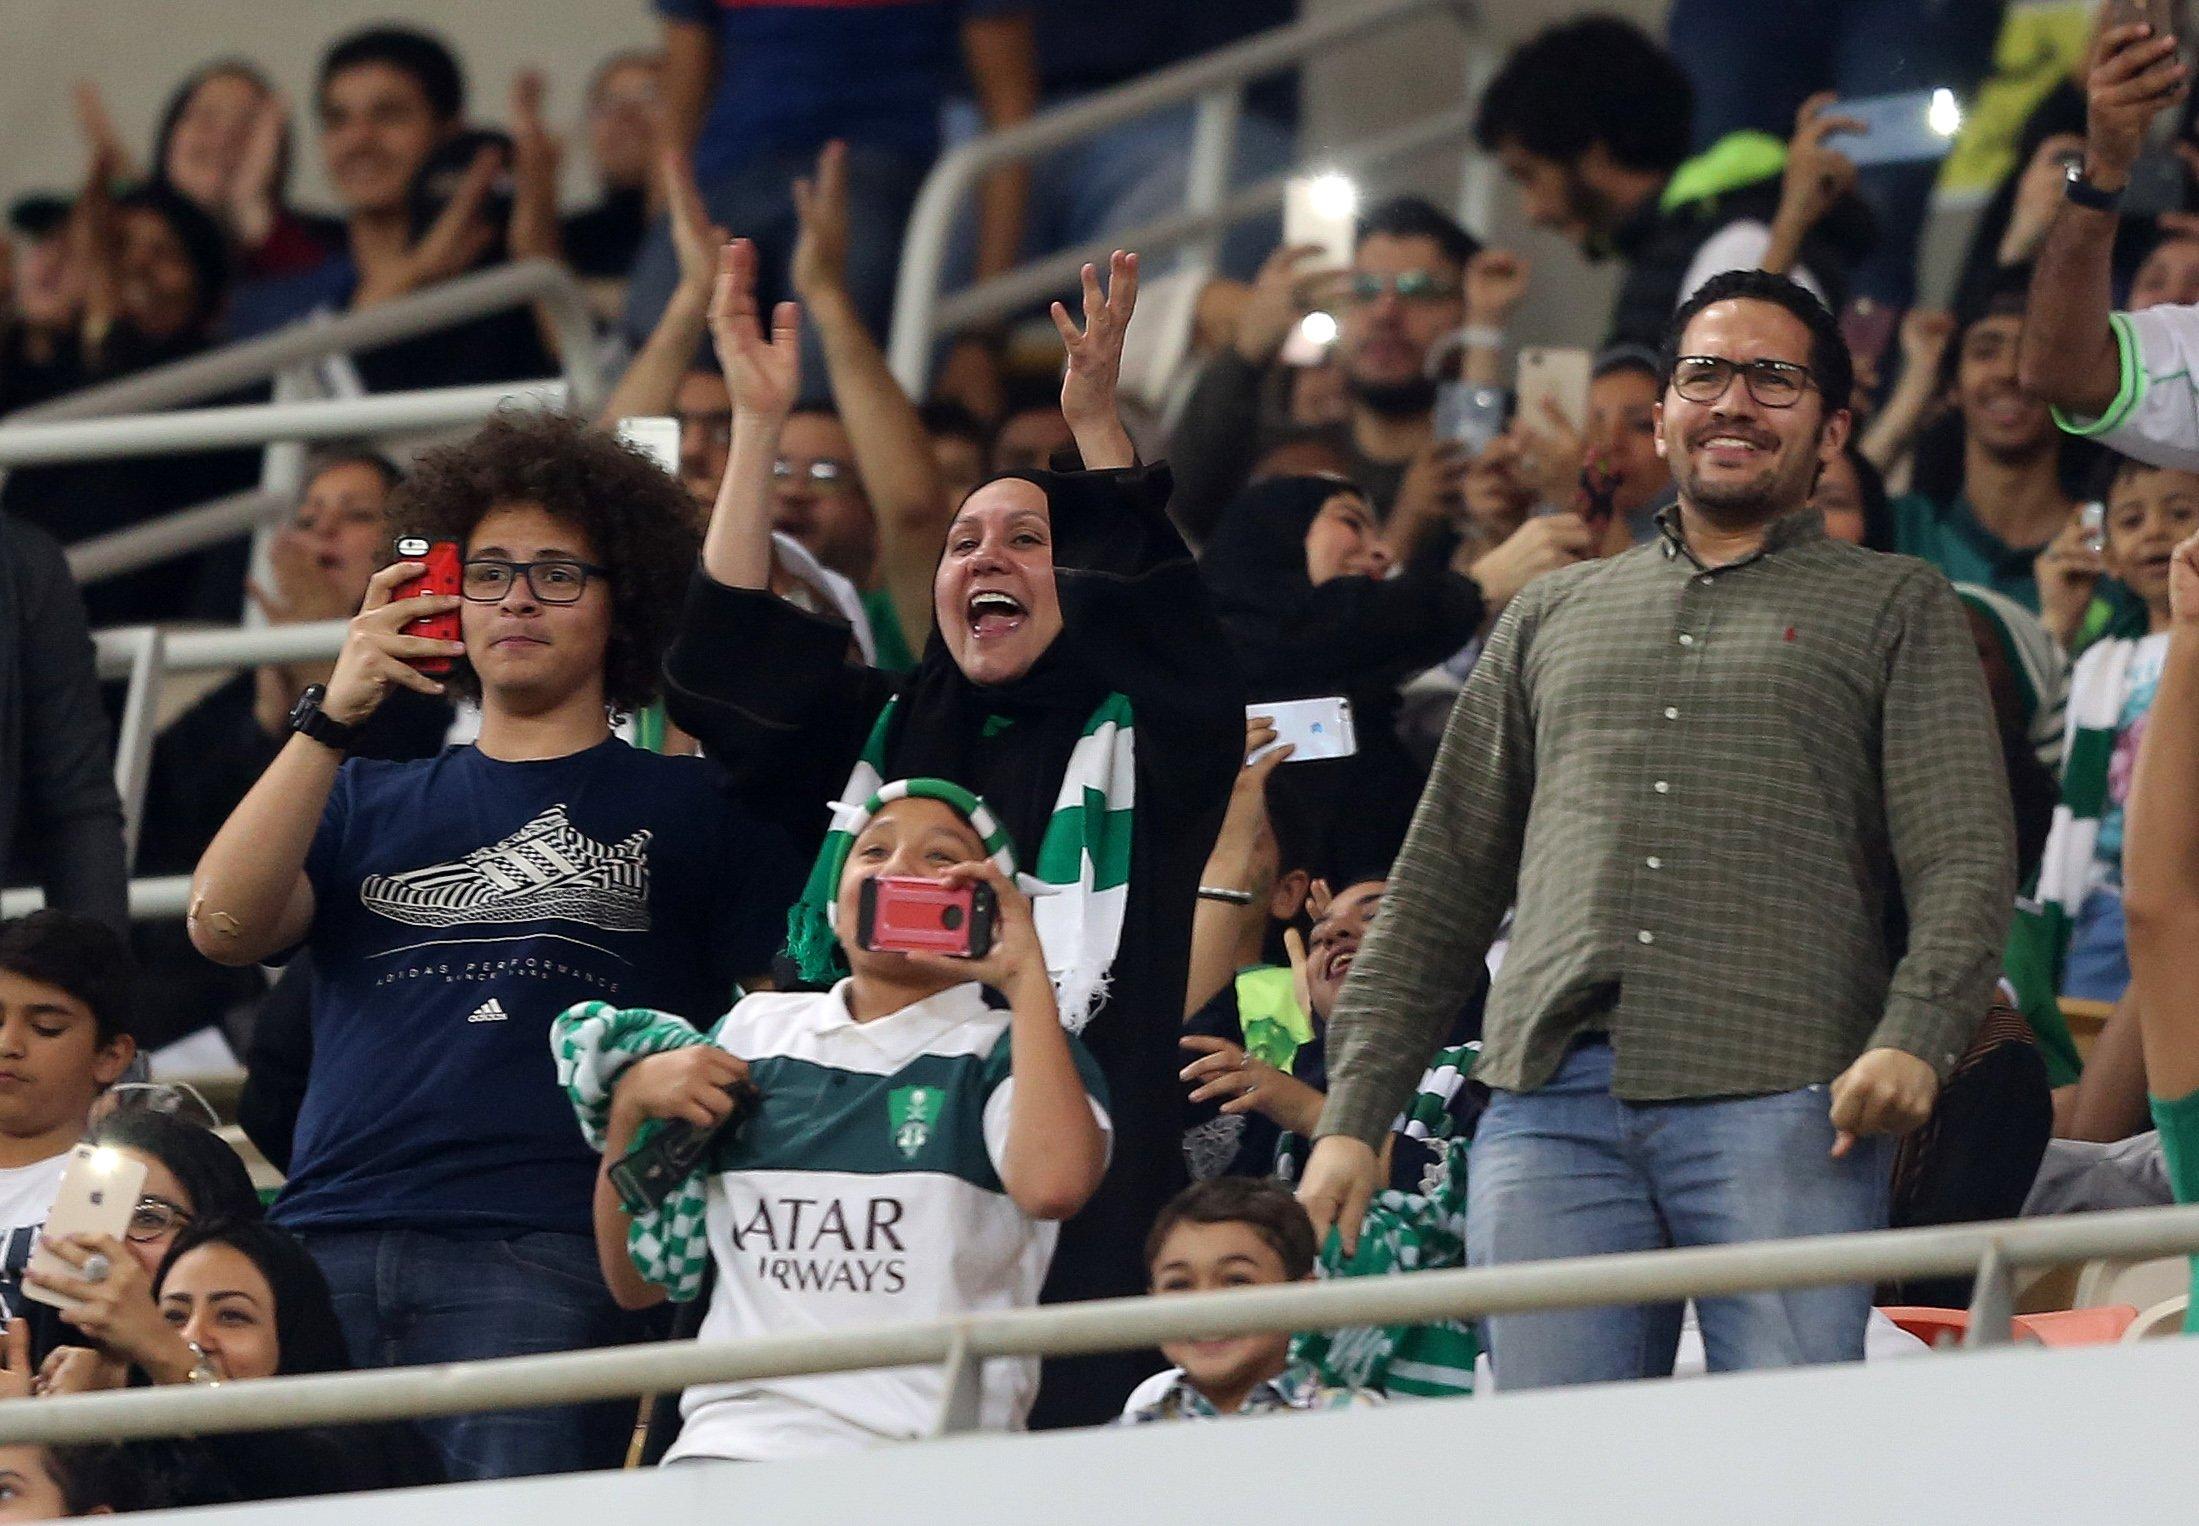 Saudi-women-score-right-to-watch-men's-soccer-in-stadiums